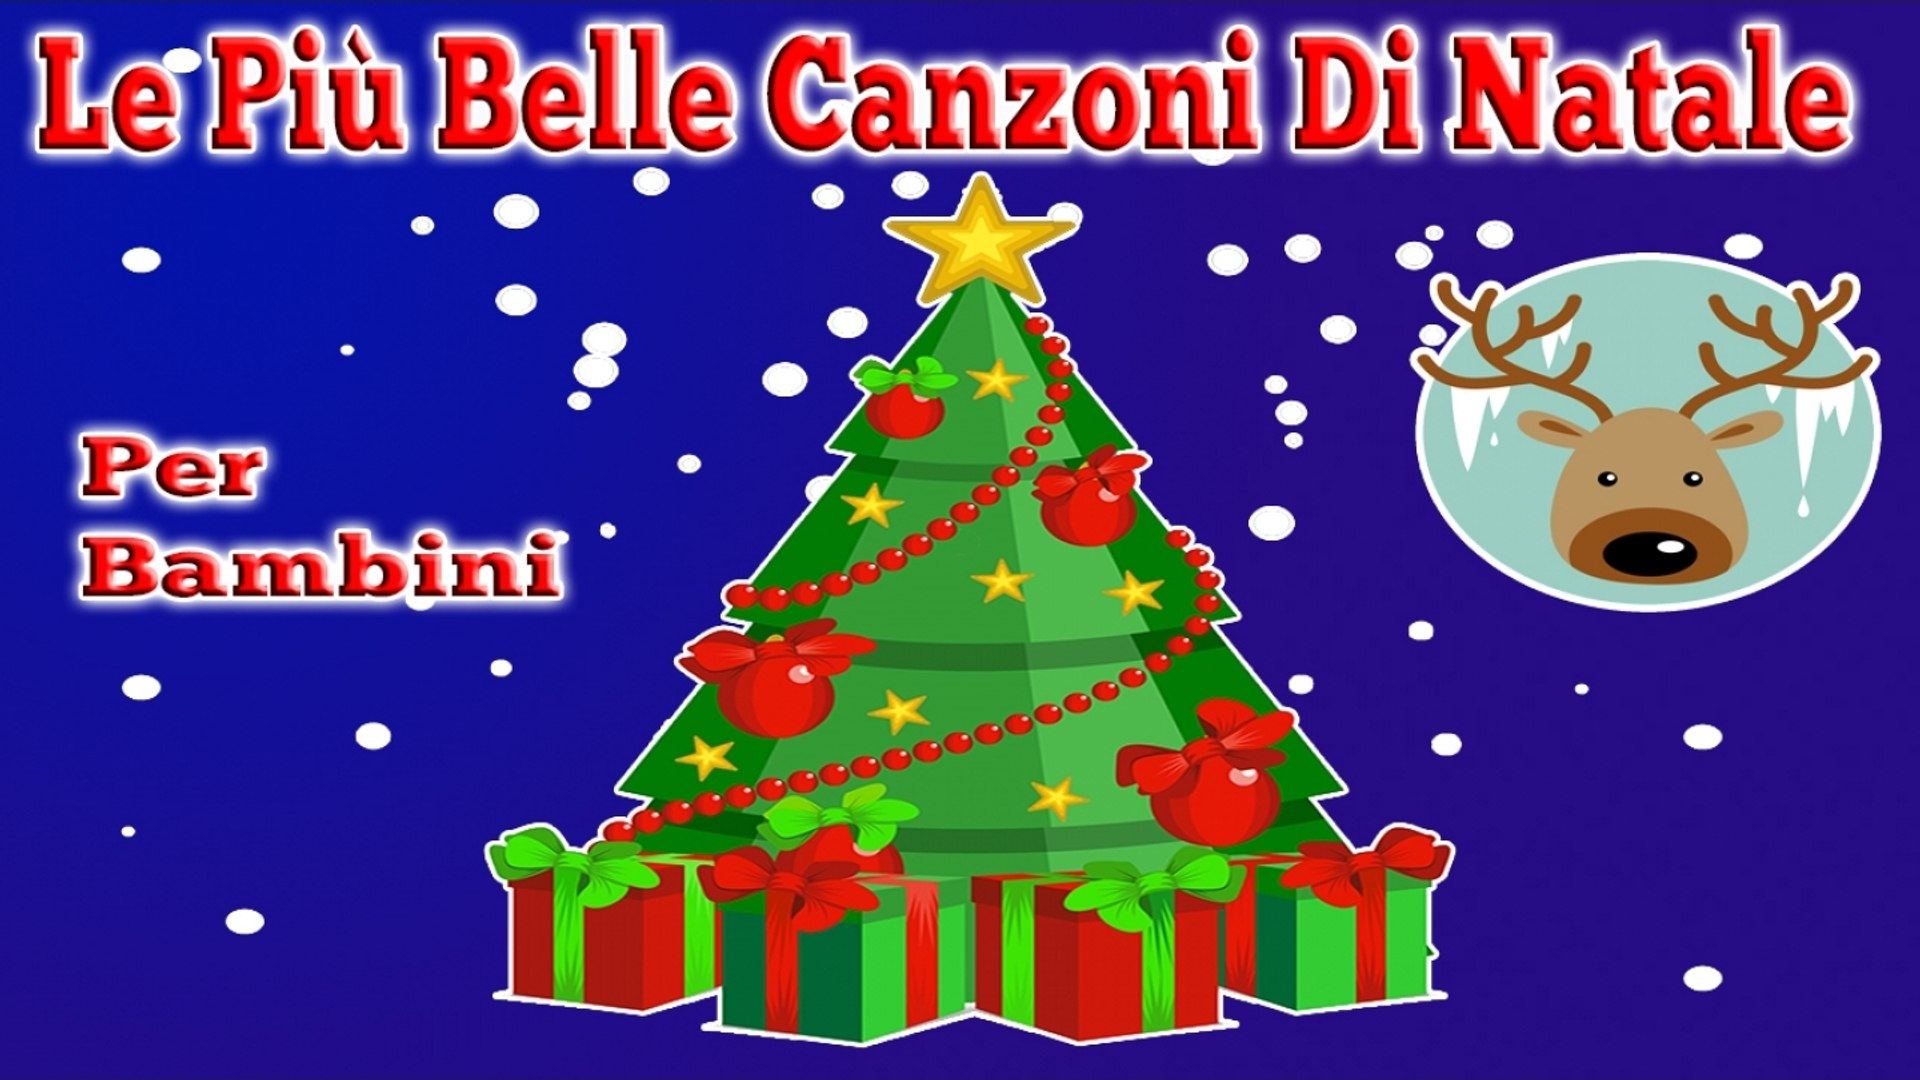 Le Piu Belle Canzoni Di Natale.Chri Le Piu Belle Canzoni Di Natale Per Bambini Video Dailymotion